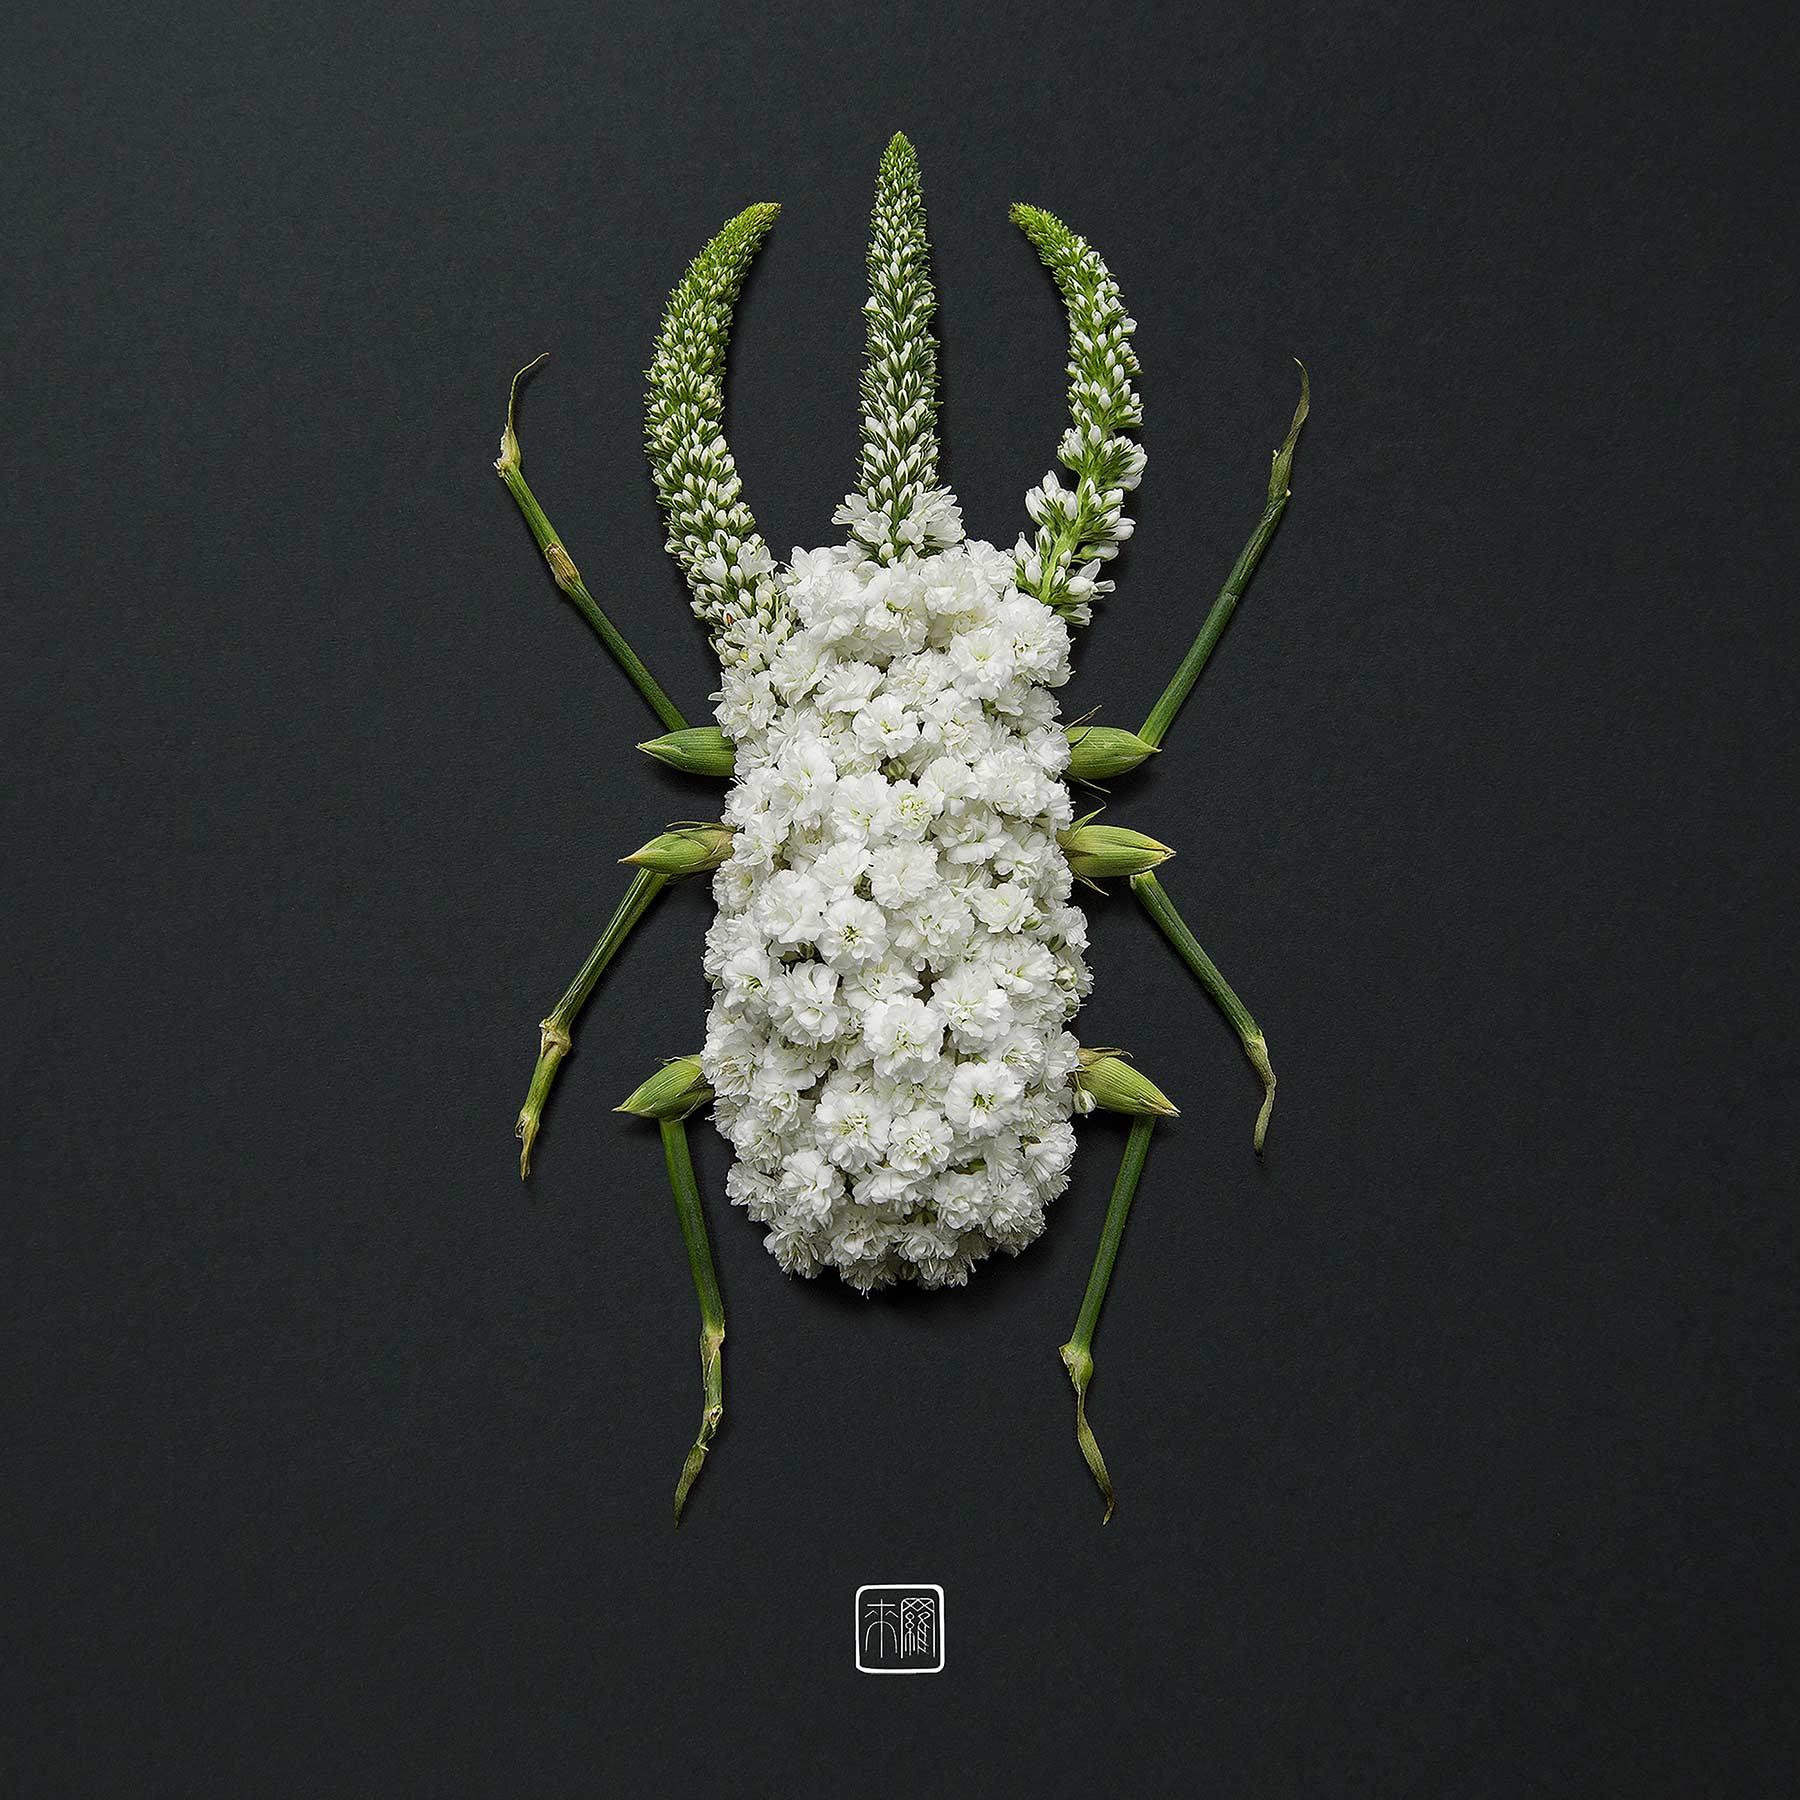 Tiere aus Blumenblüten Tiere-aus-blumenblueten-Raku-Inoue_04